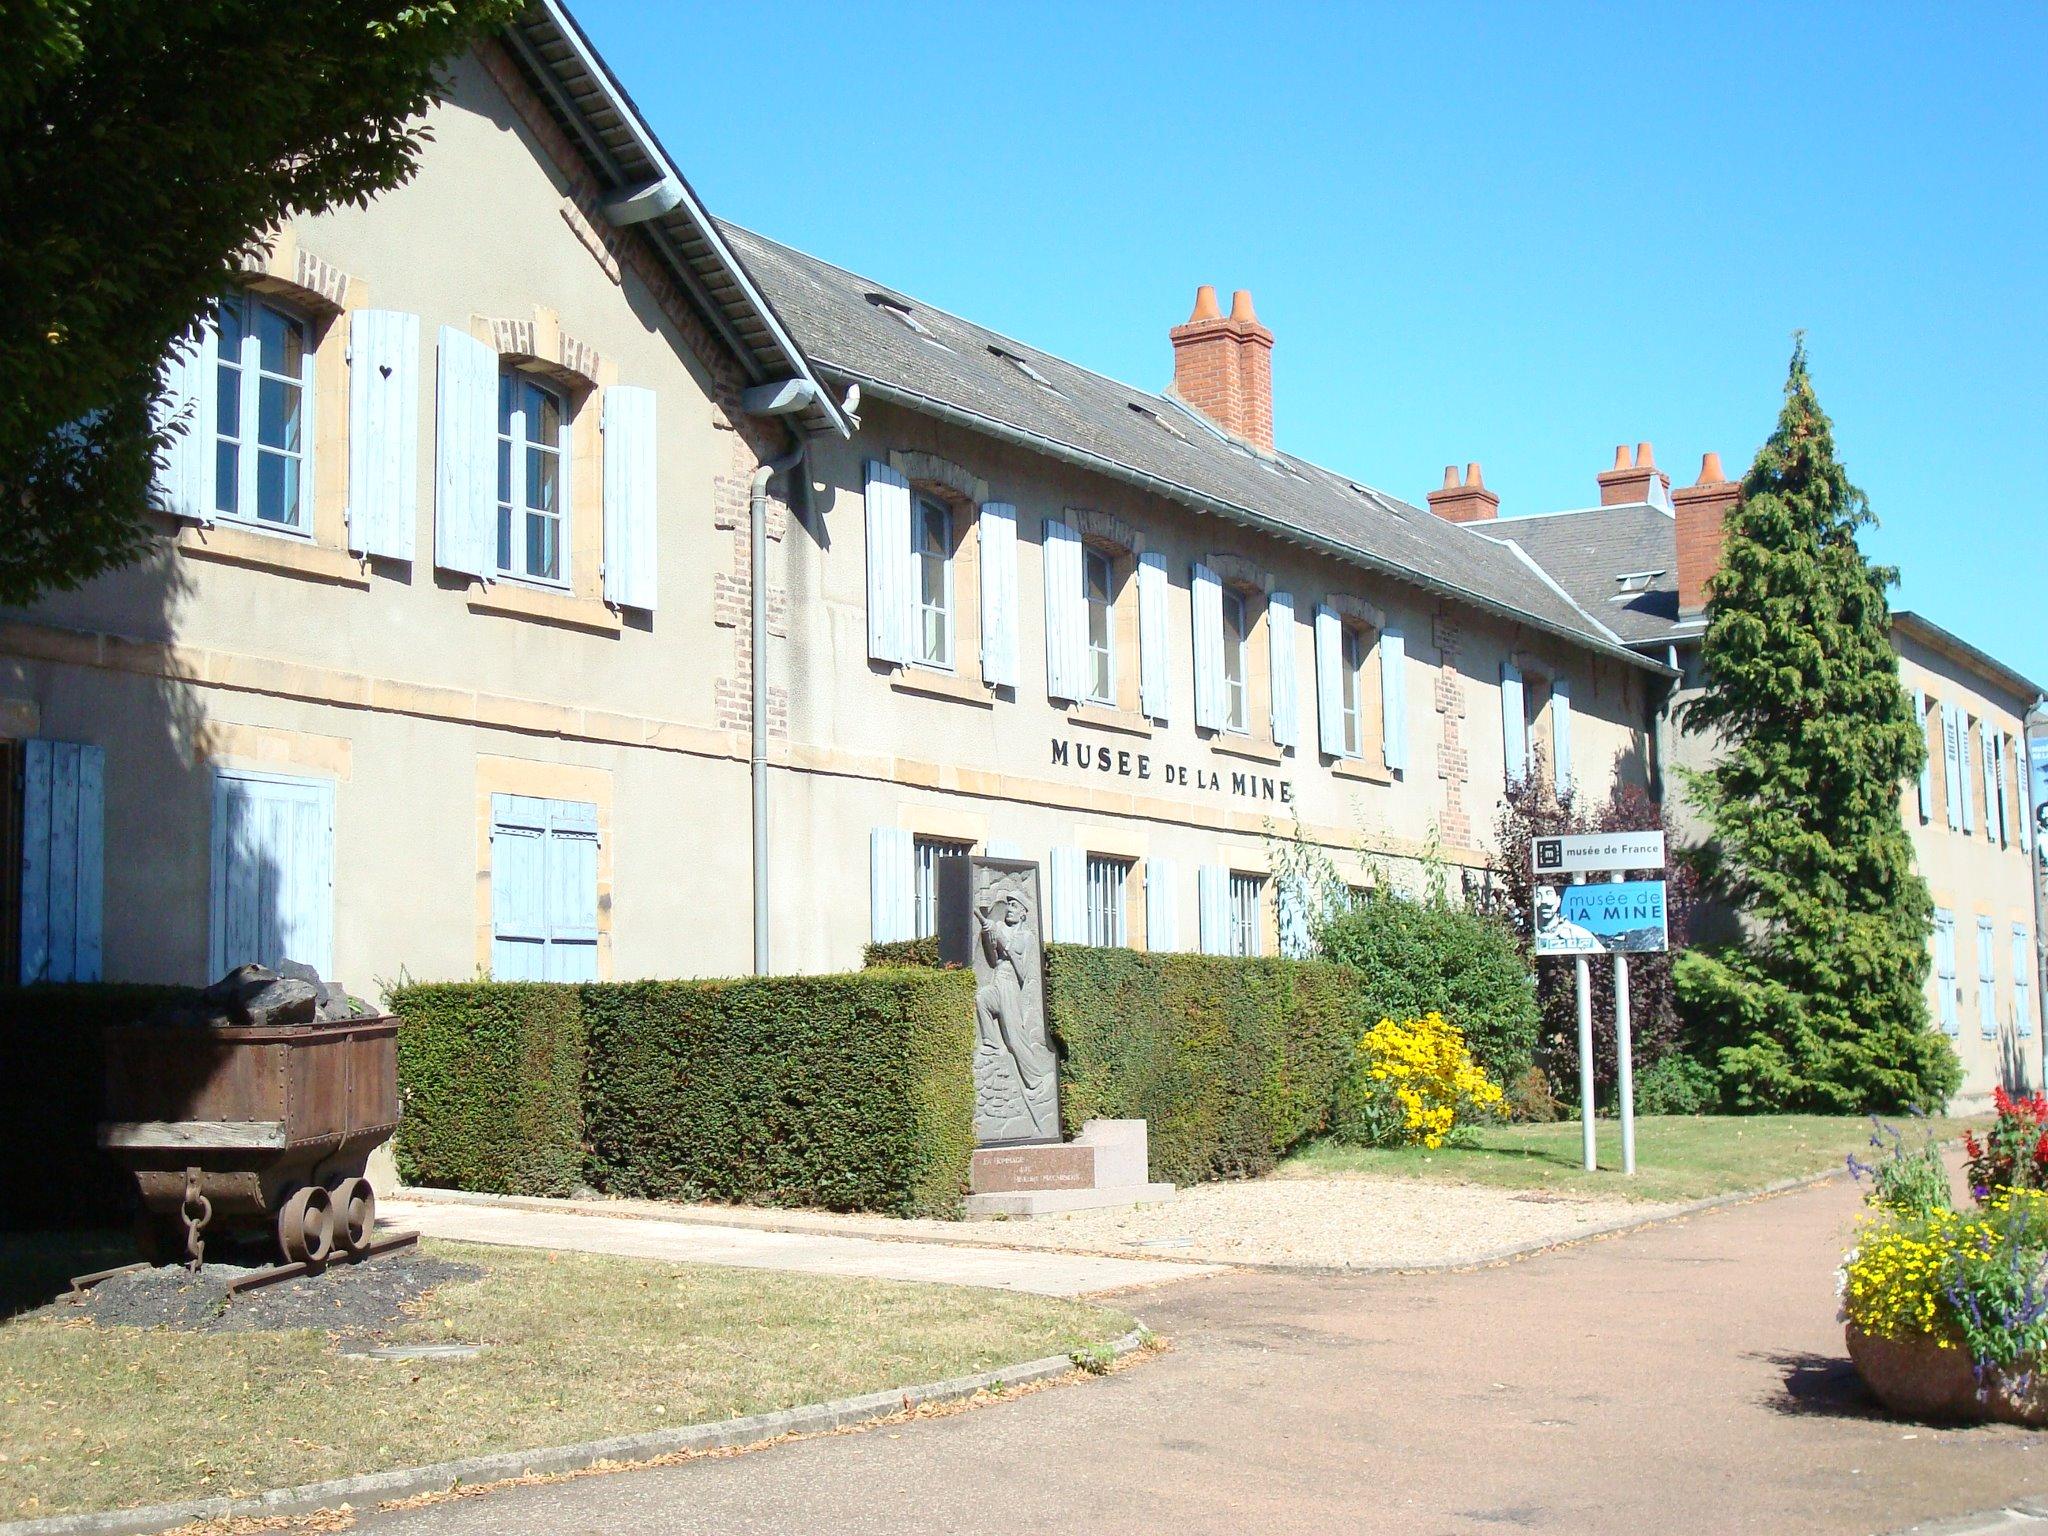 2553-musee-de-la-mine-de-la-machine-nievre-58.jpg